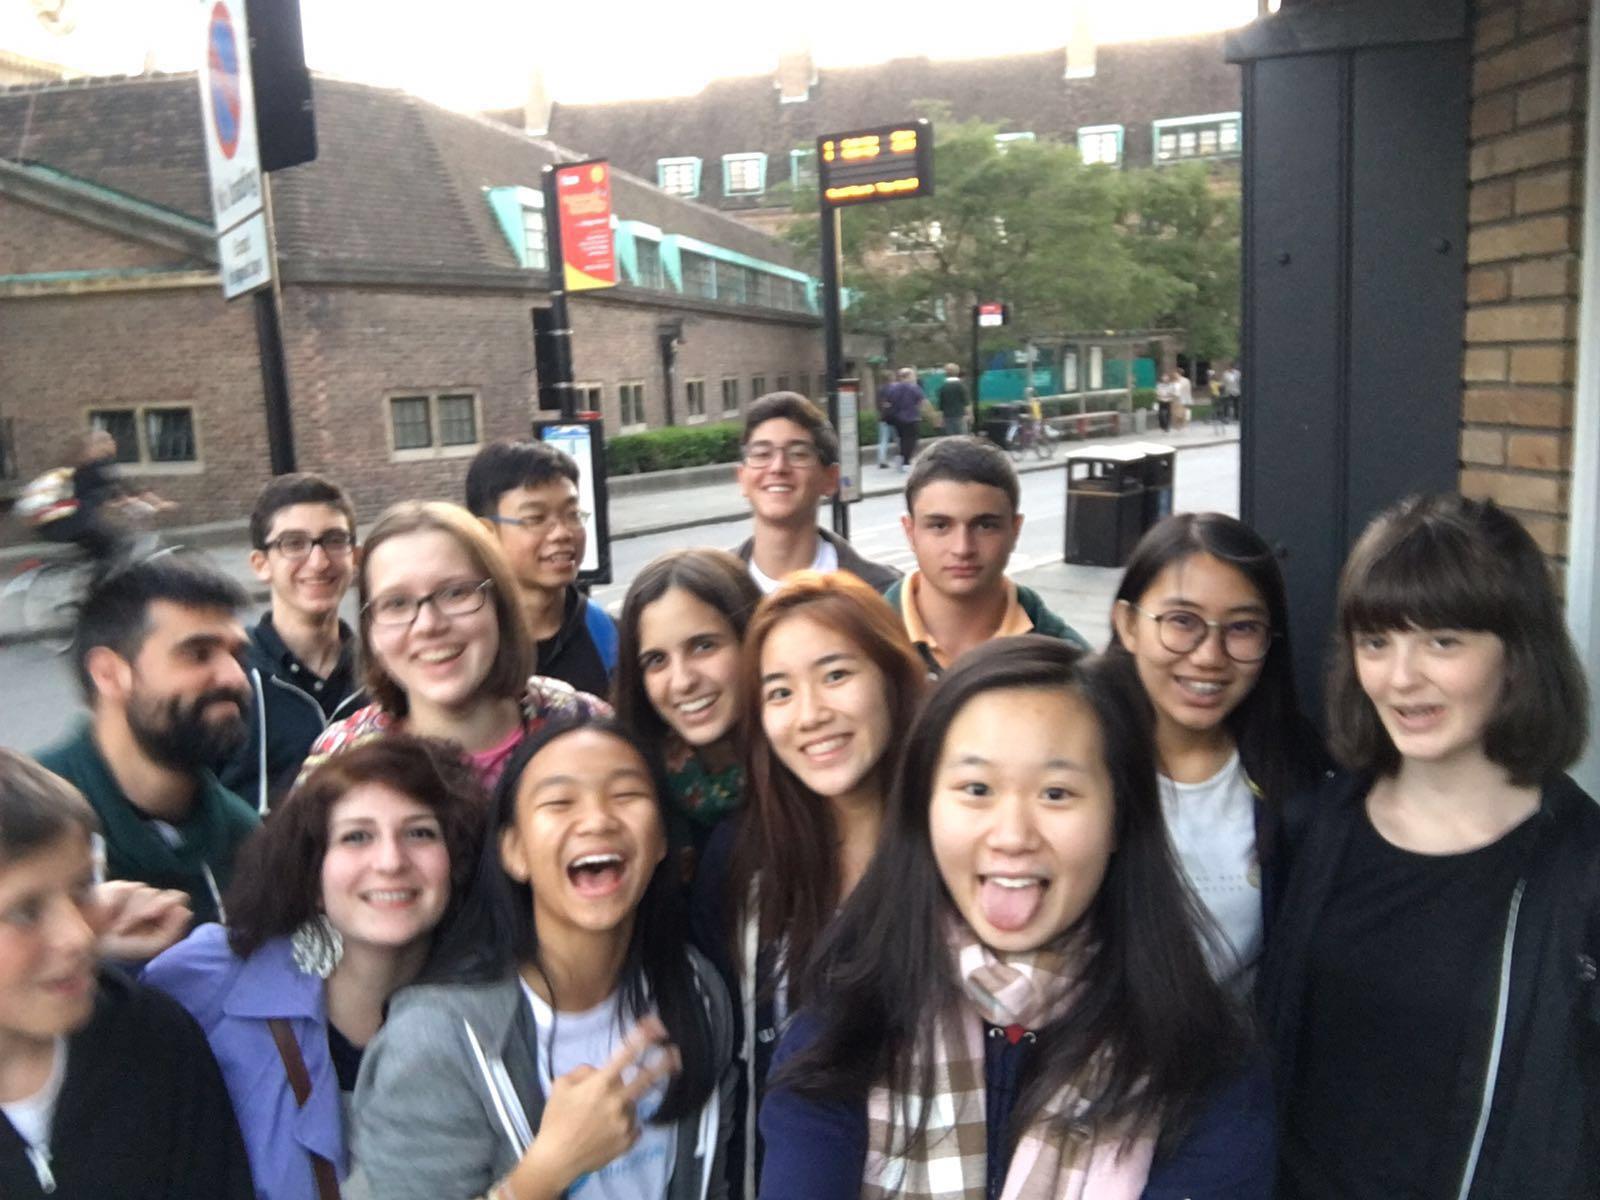 Summer Program - Entrepreneurship | Lite Regal Summer School